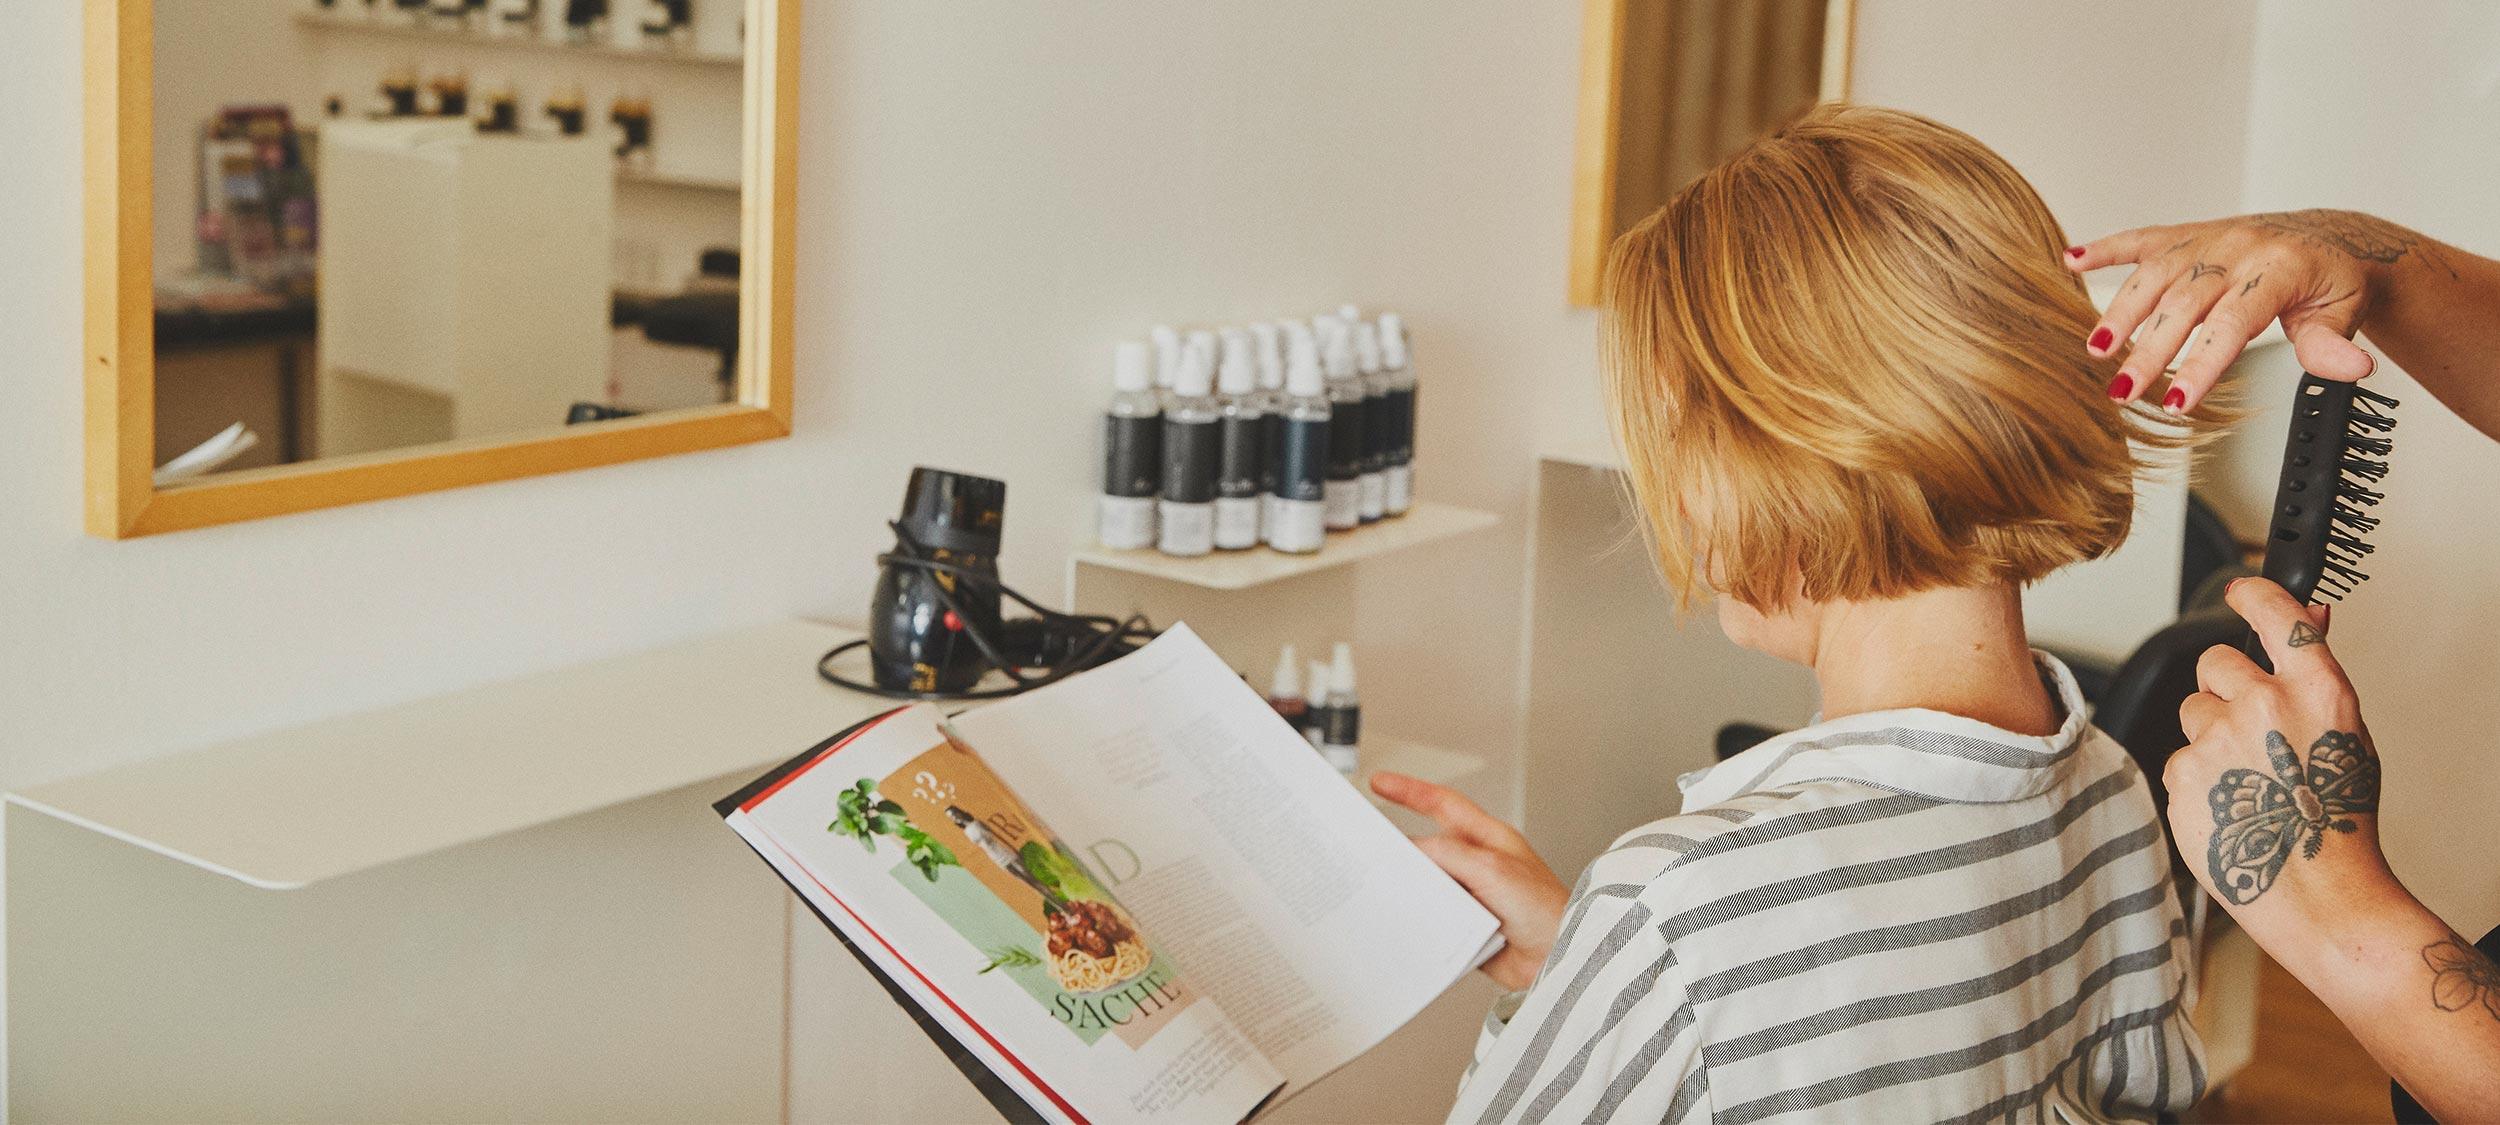 Grätzl-Tipp Nr.3: Salon minusplus – Look like yourself